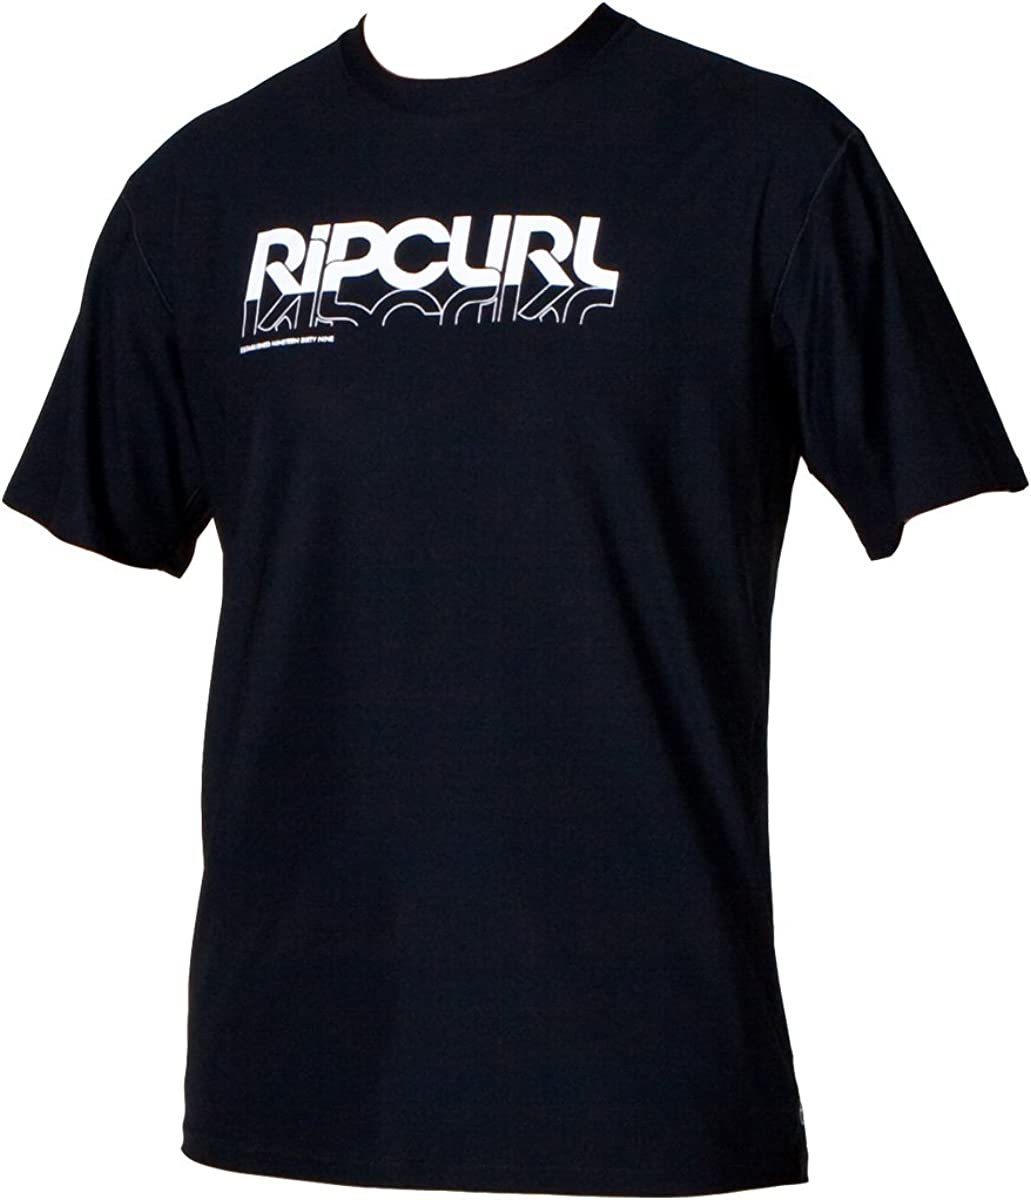 Rip Curl Men's Core Reflecto Surf Shirt Rashguard